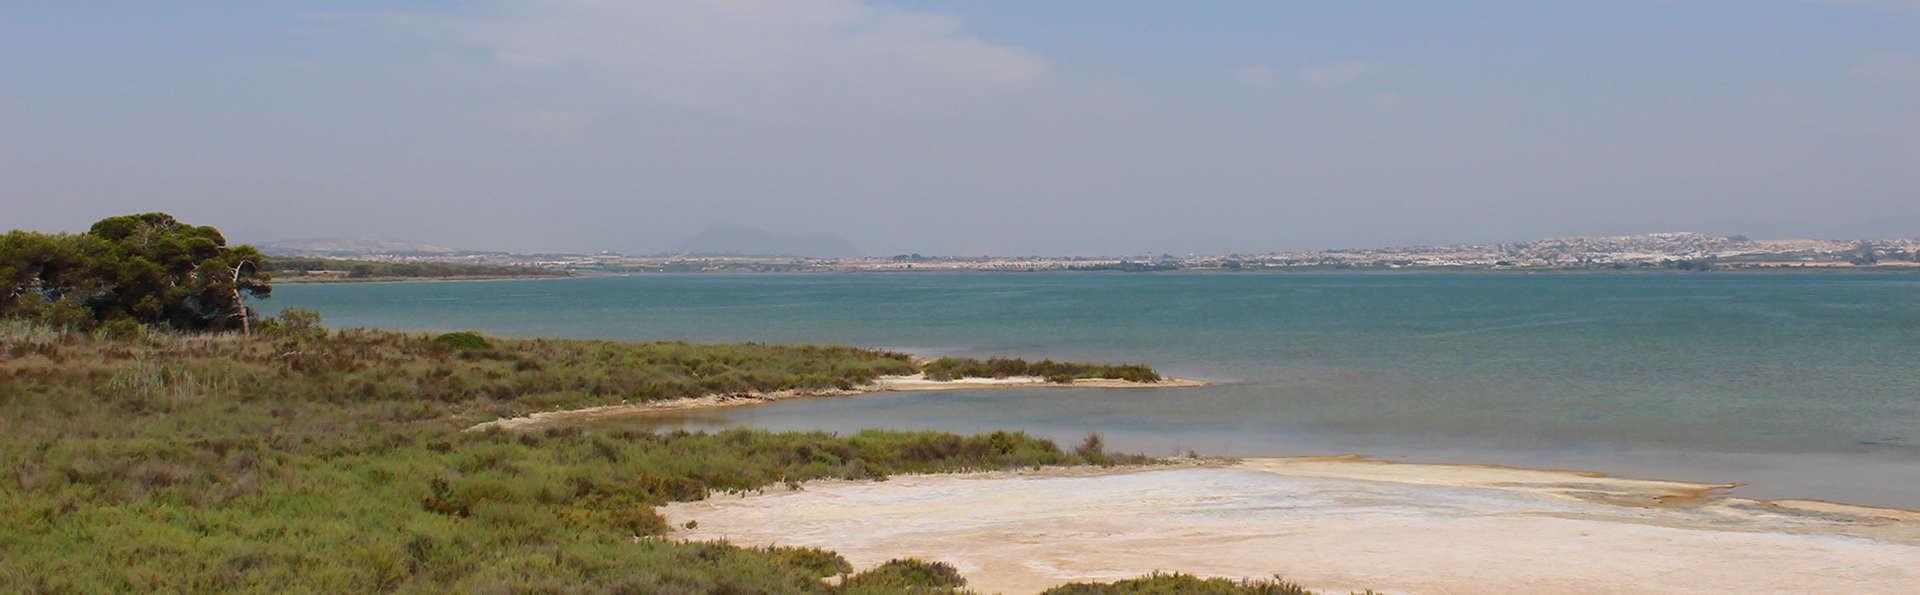 Hotel Playas de Torrevieja - edit_destino3.jpg